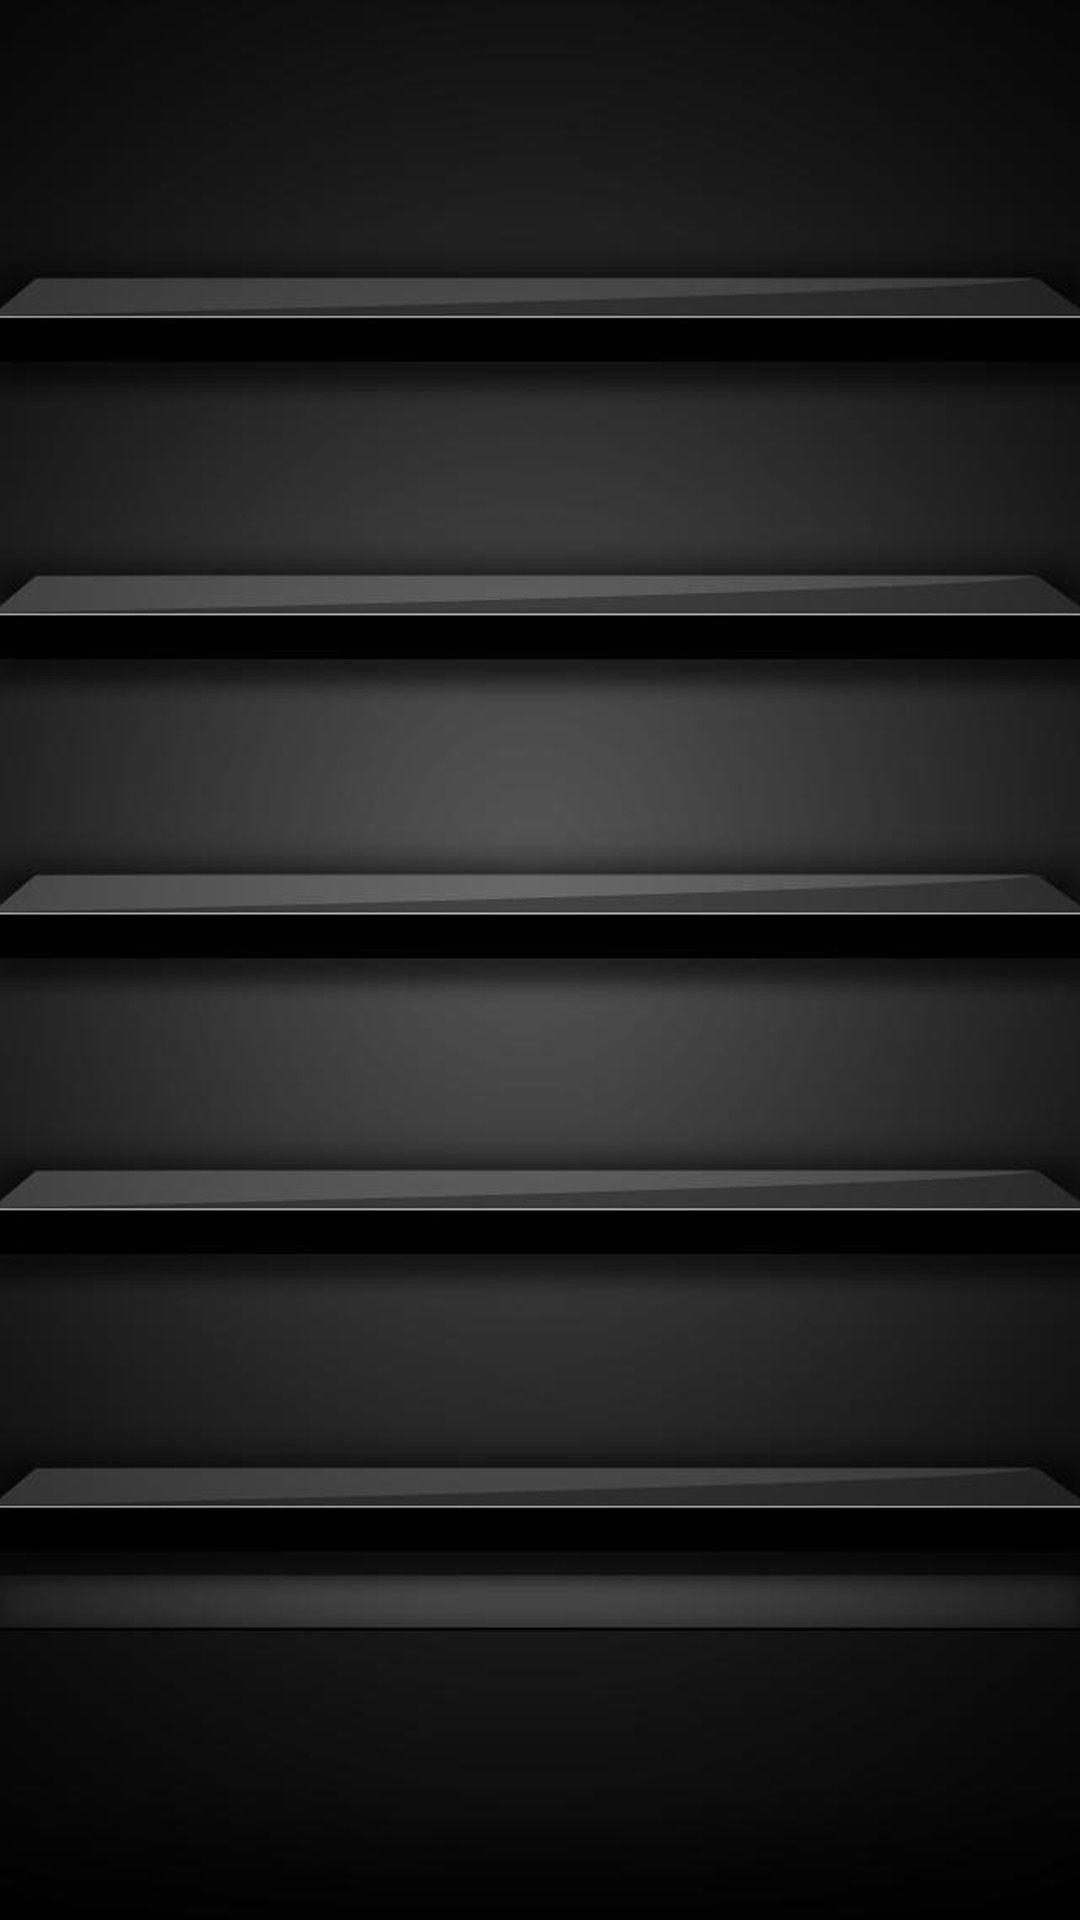 Black Iphone 6 Plus Wallpapers Top Free Black Iphone 6